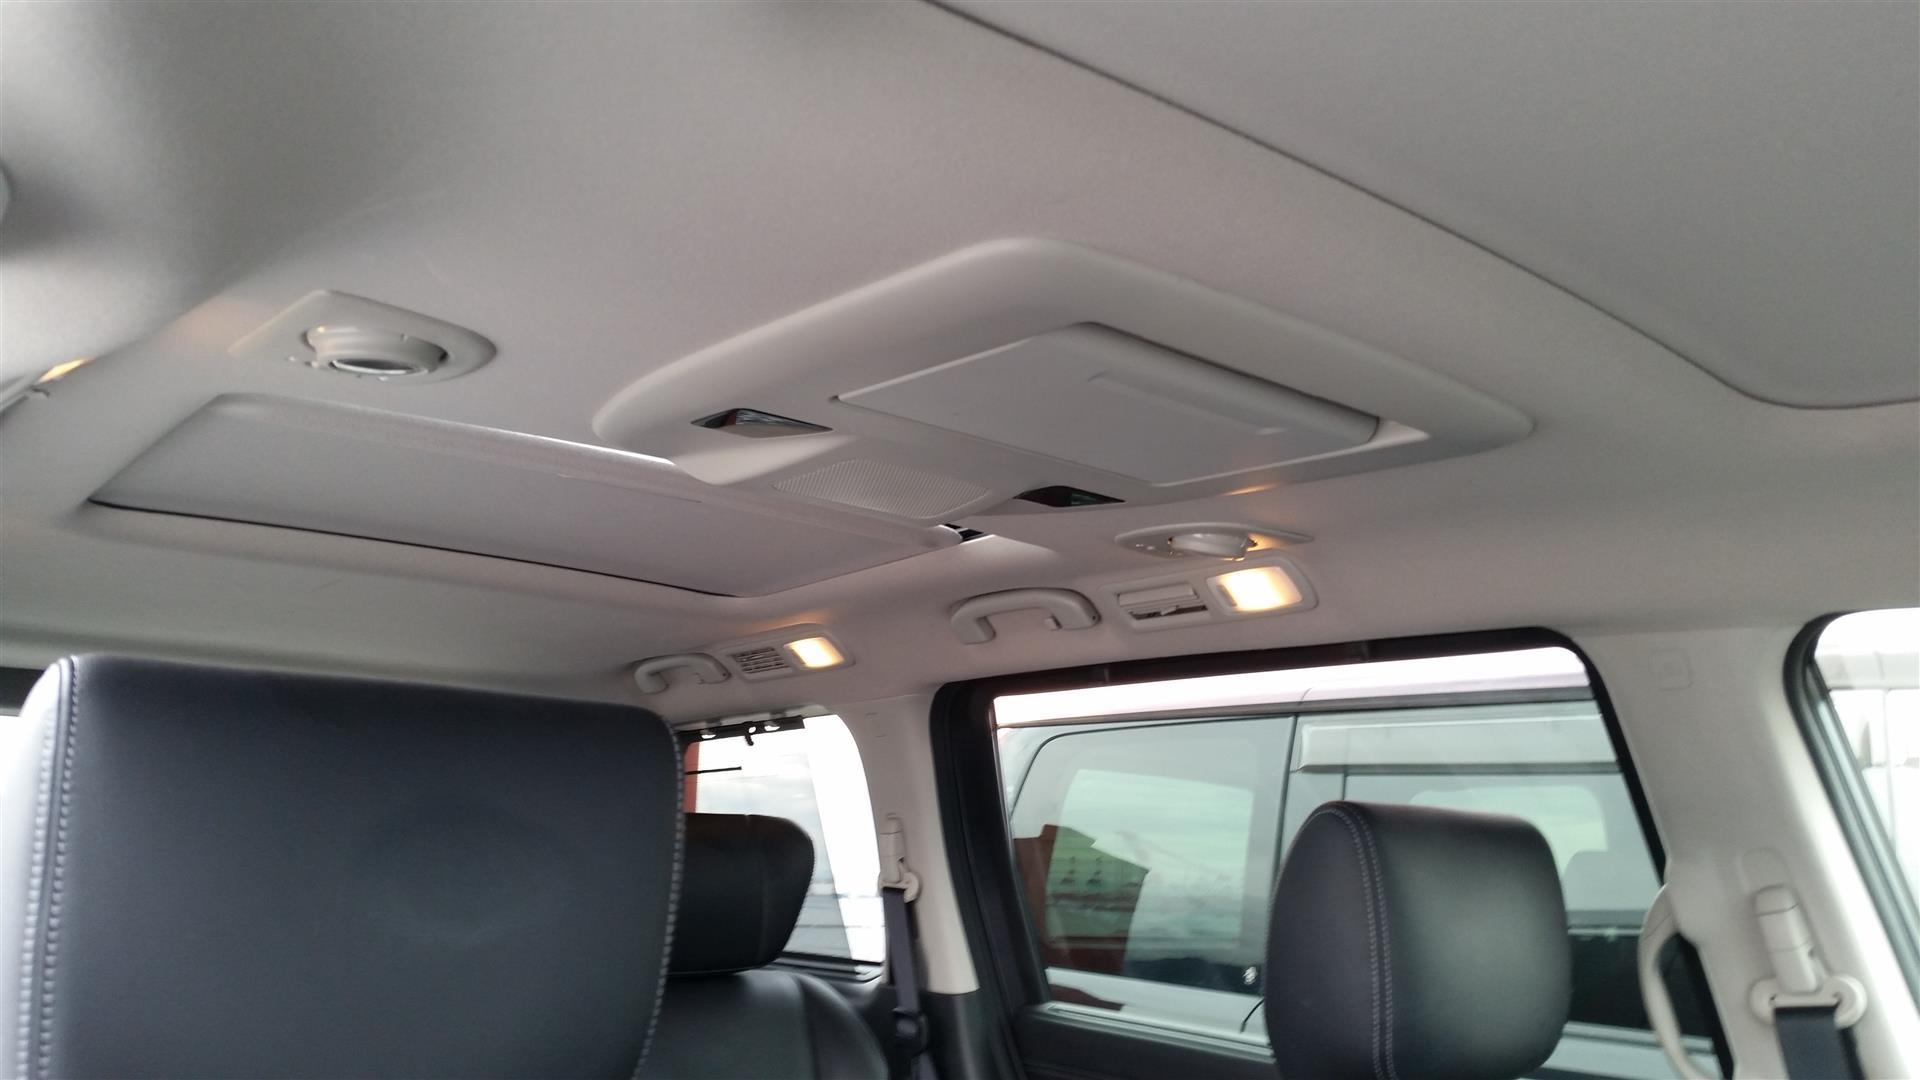 2012 Nissan Elgrand E52 20150627_143608 (Large)